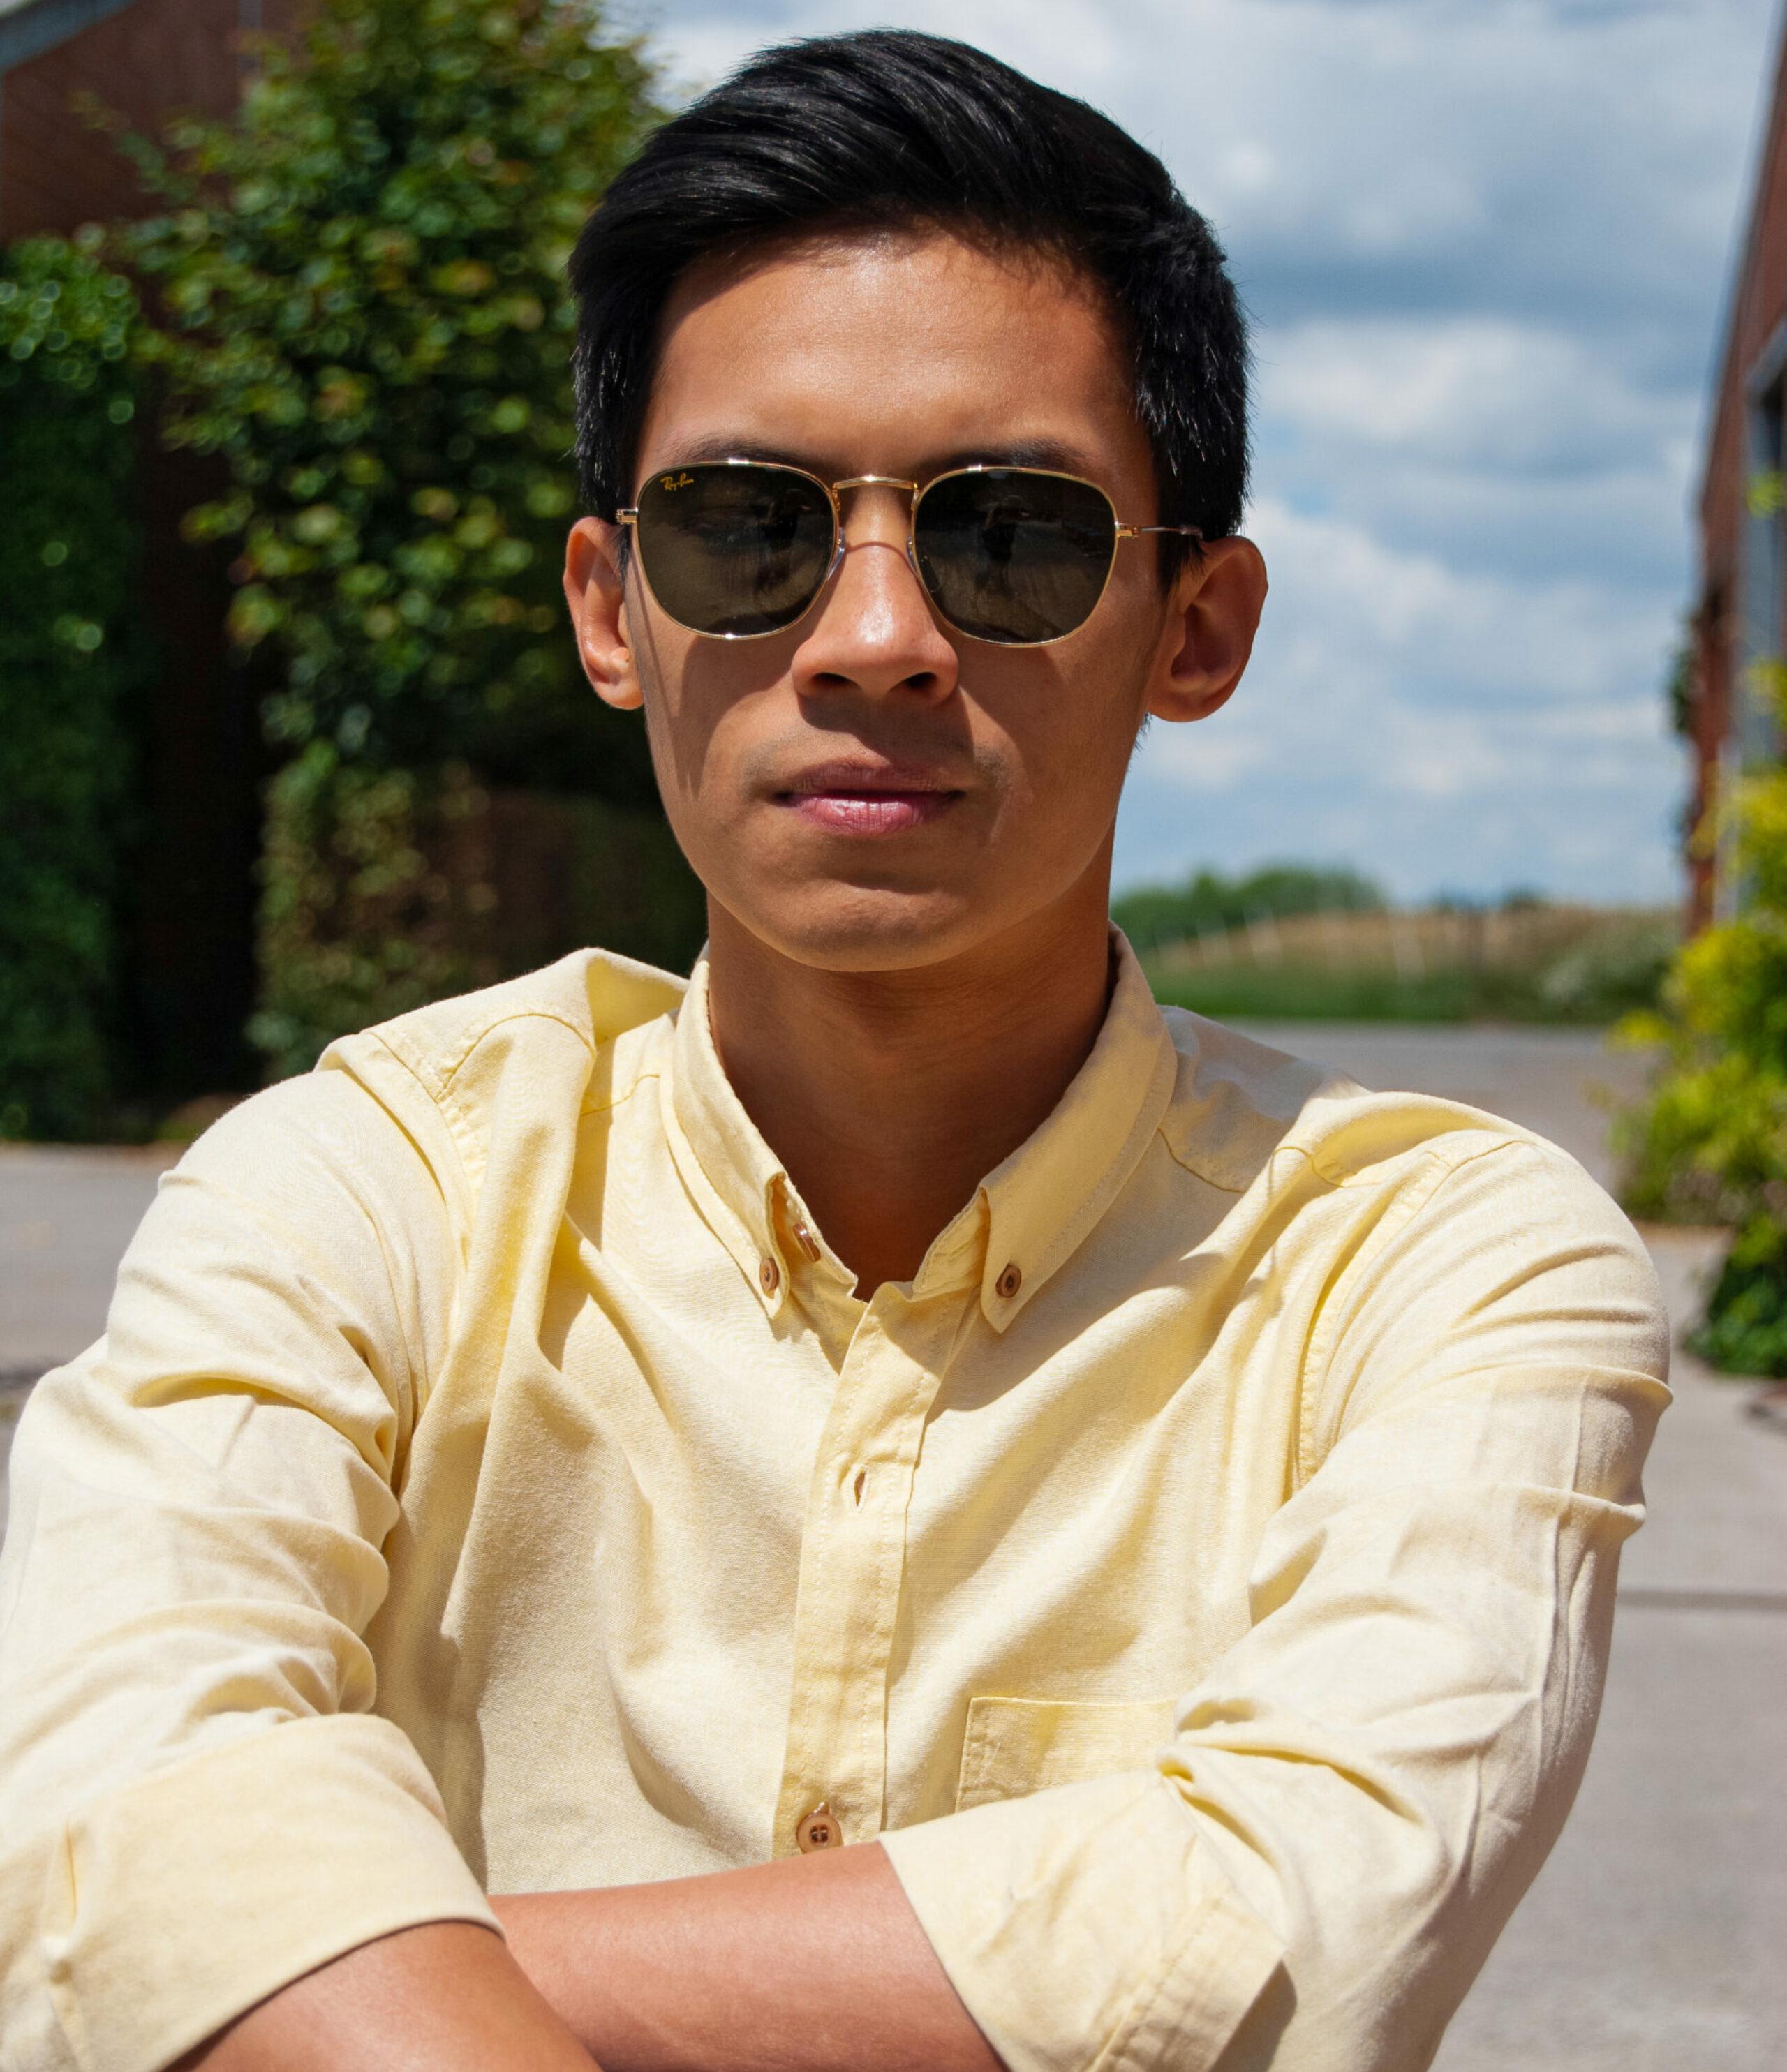 Ray-Ban brillen en zonnebrillen - Frames and Faces Deinze